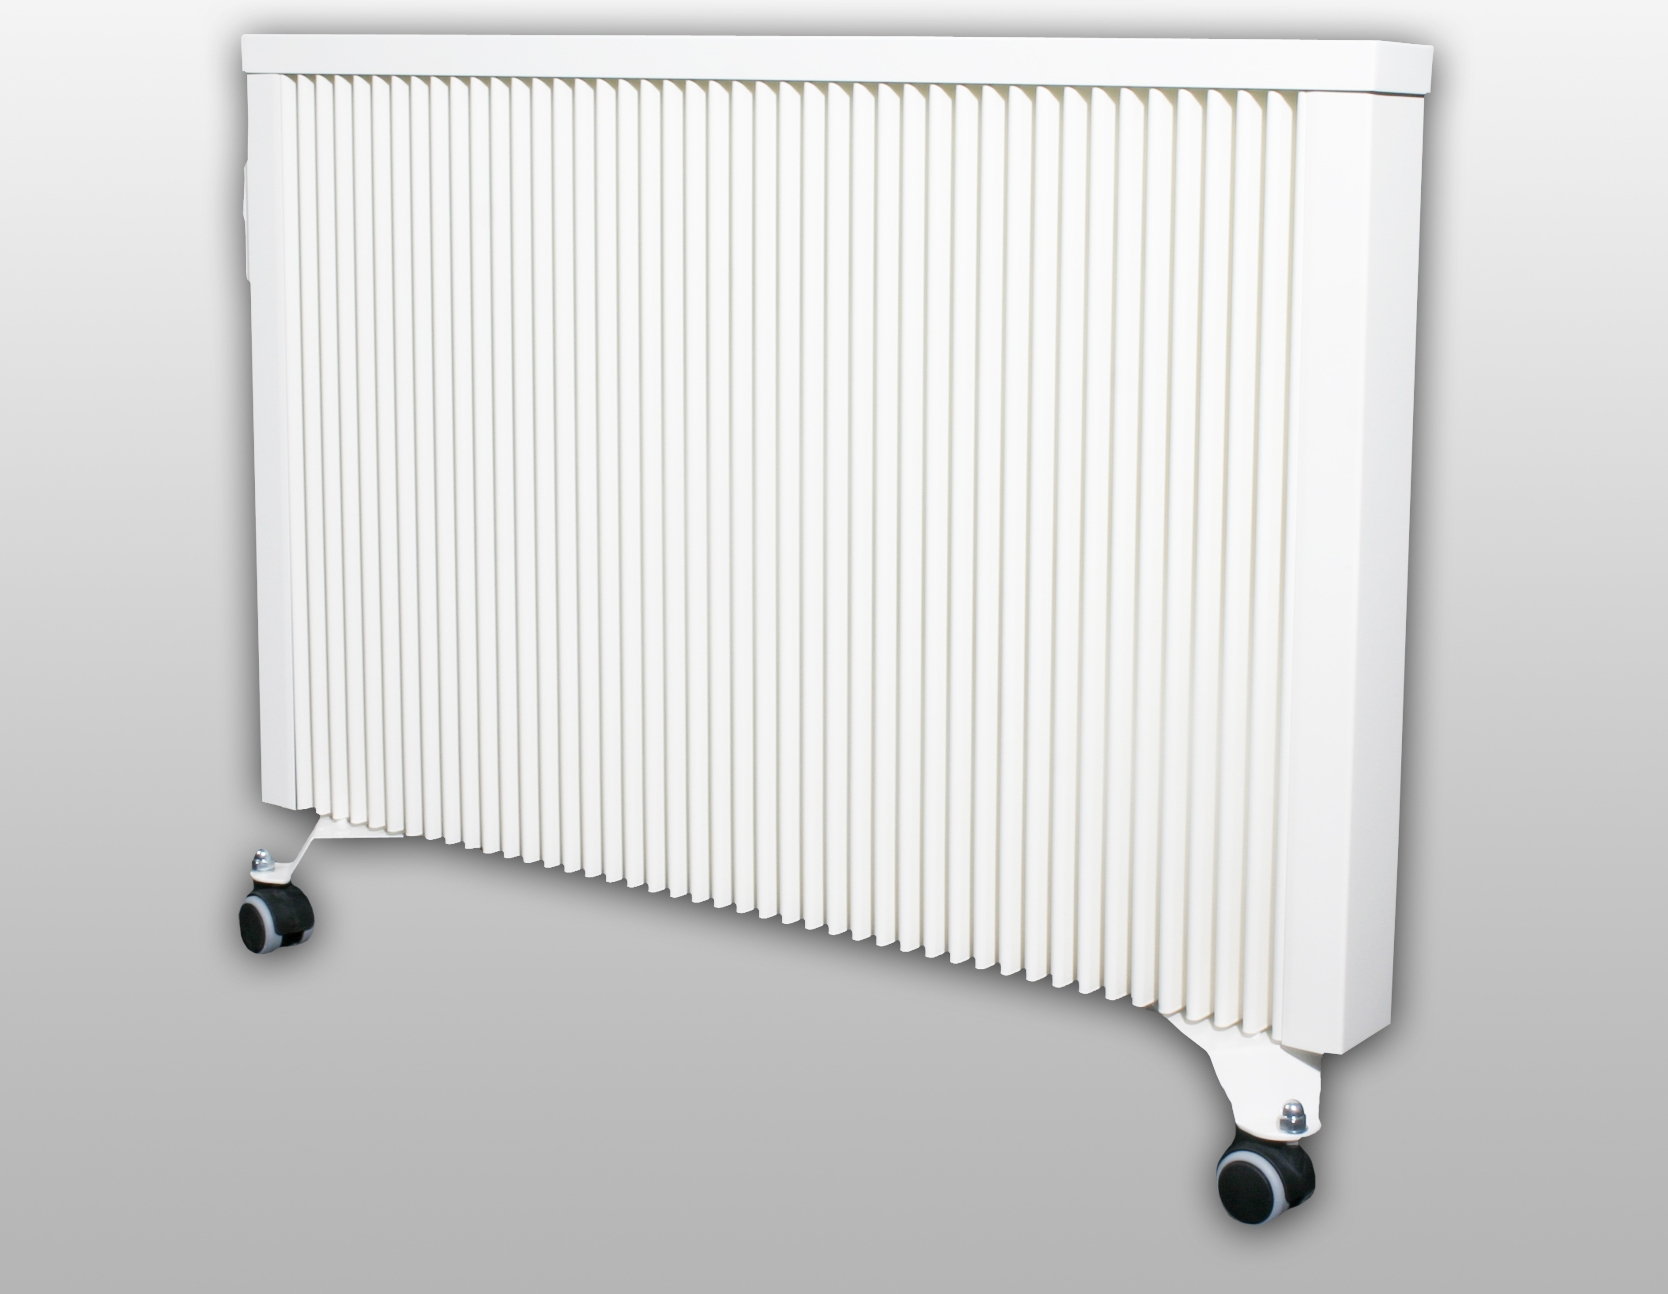 Dvojitý topný panel HD, TYP HD 100, 1000 W